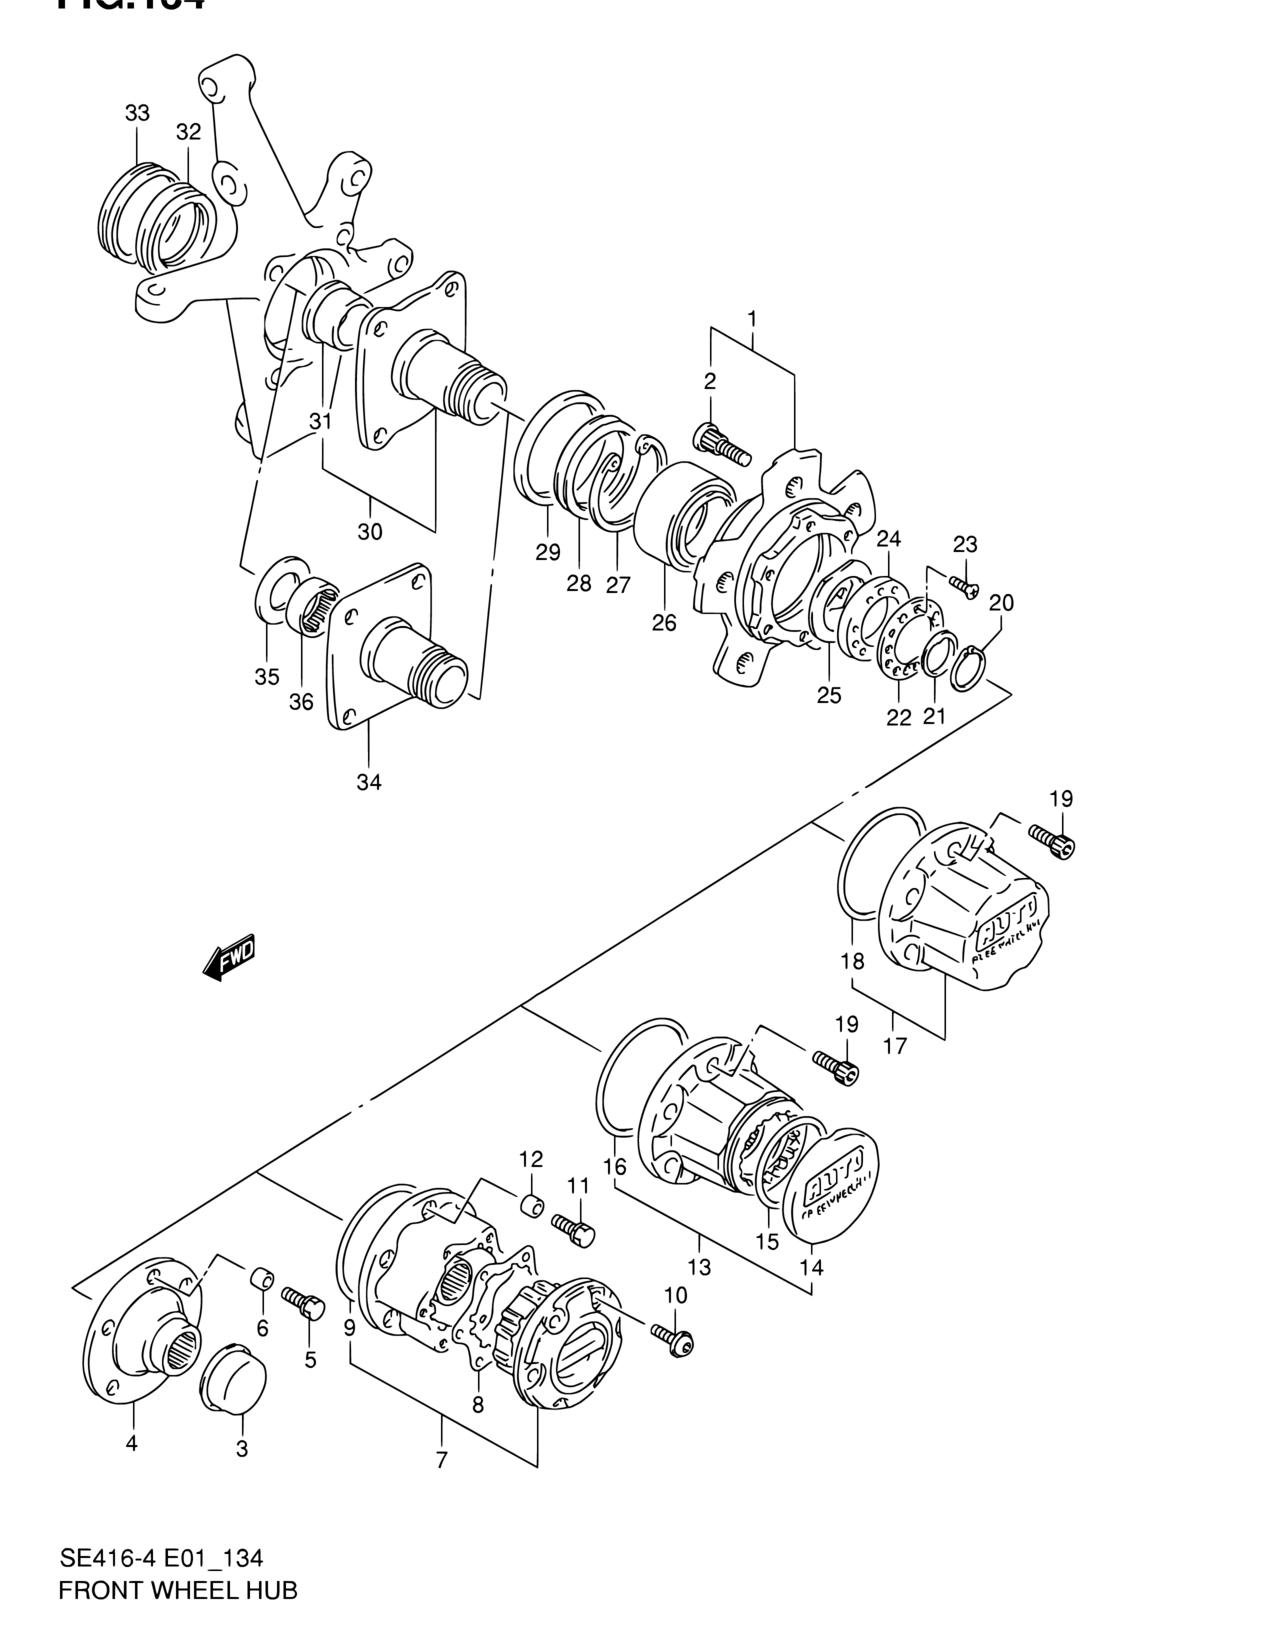 Asia Vitara Sidekick Se416 4 Suspension 134 Front Wheel Hub Diagram Notes